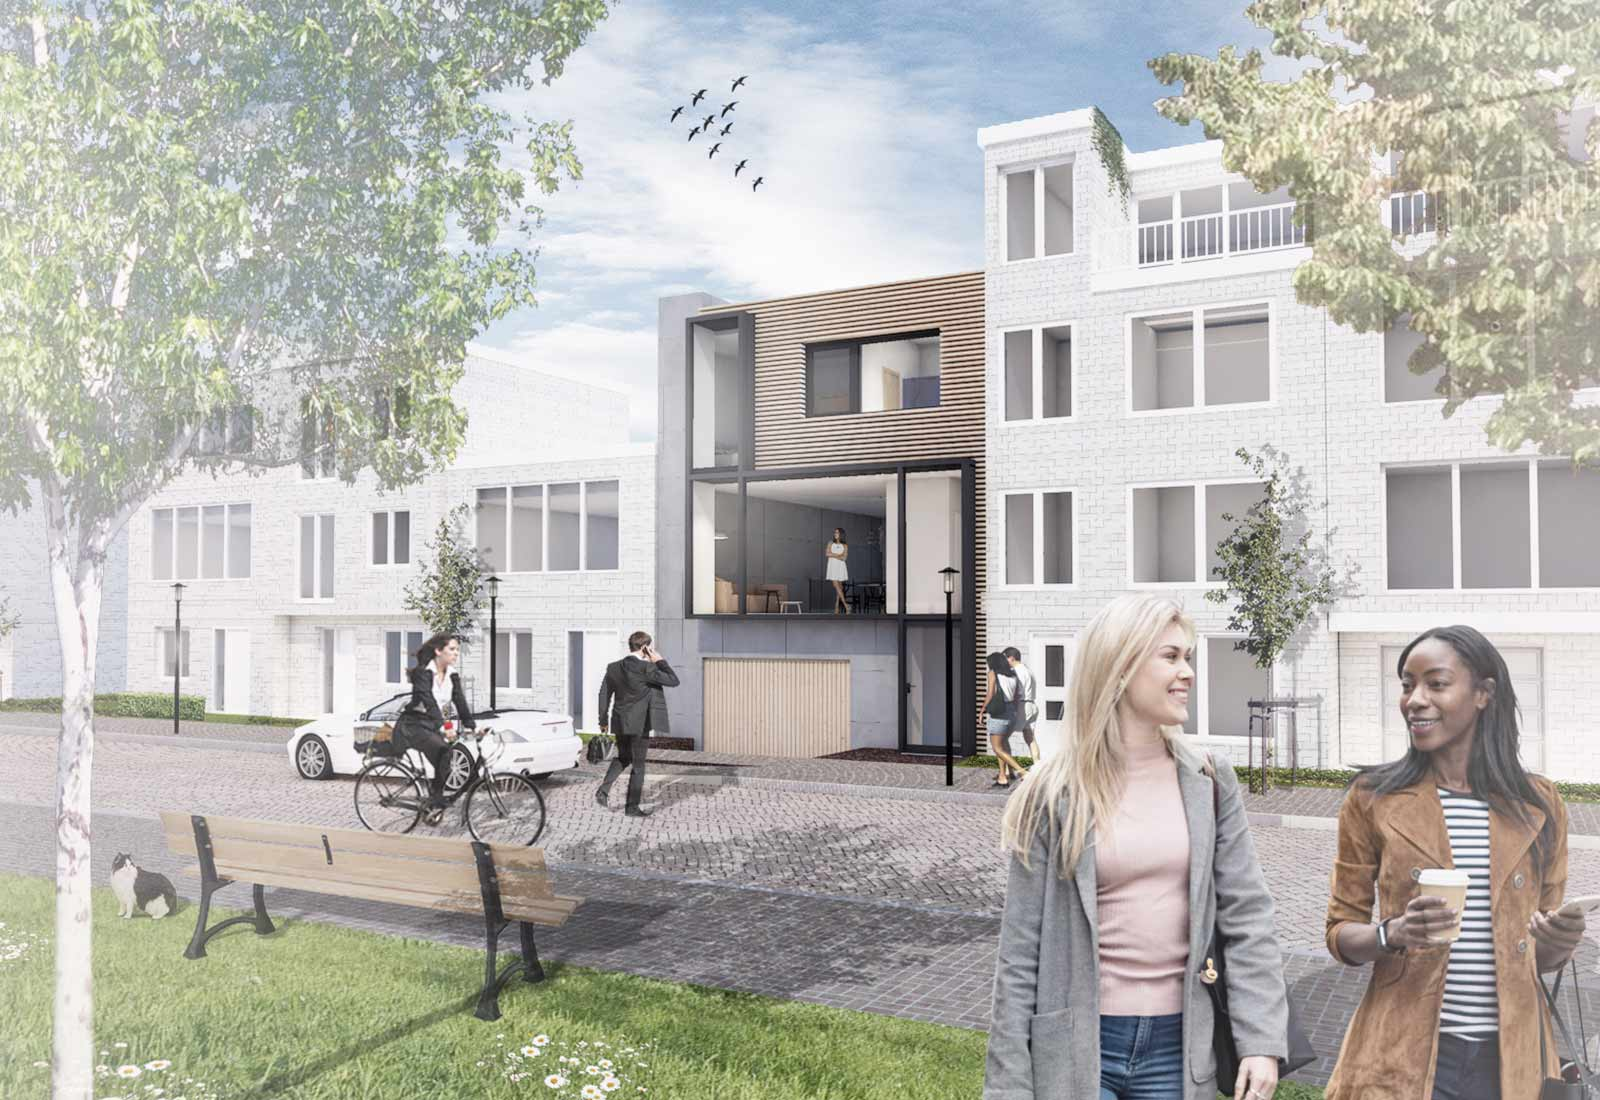 Nugter-architectuur-zelfbouw-kavel-garage-woning